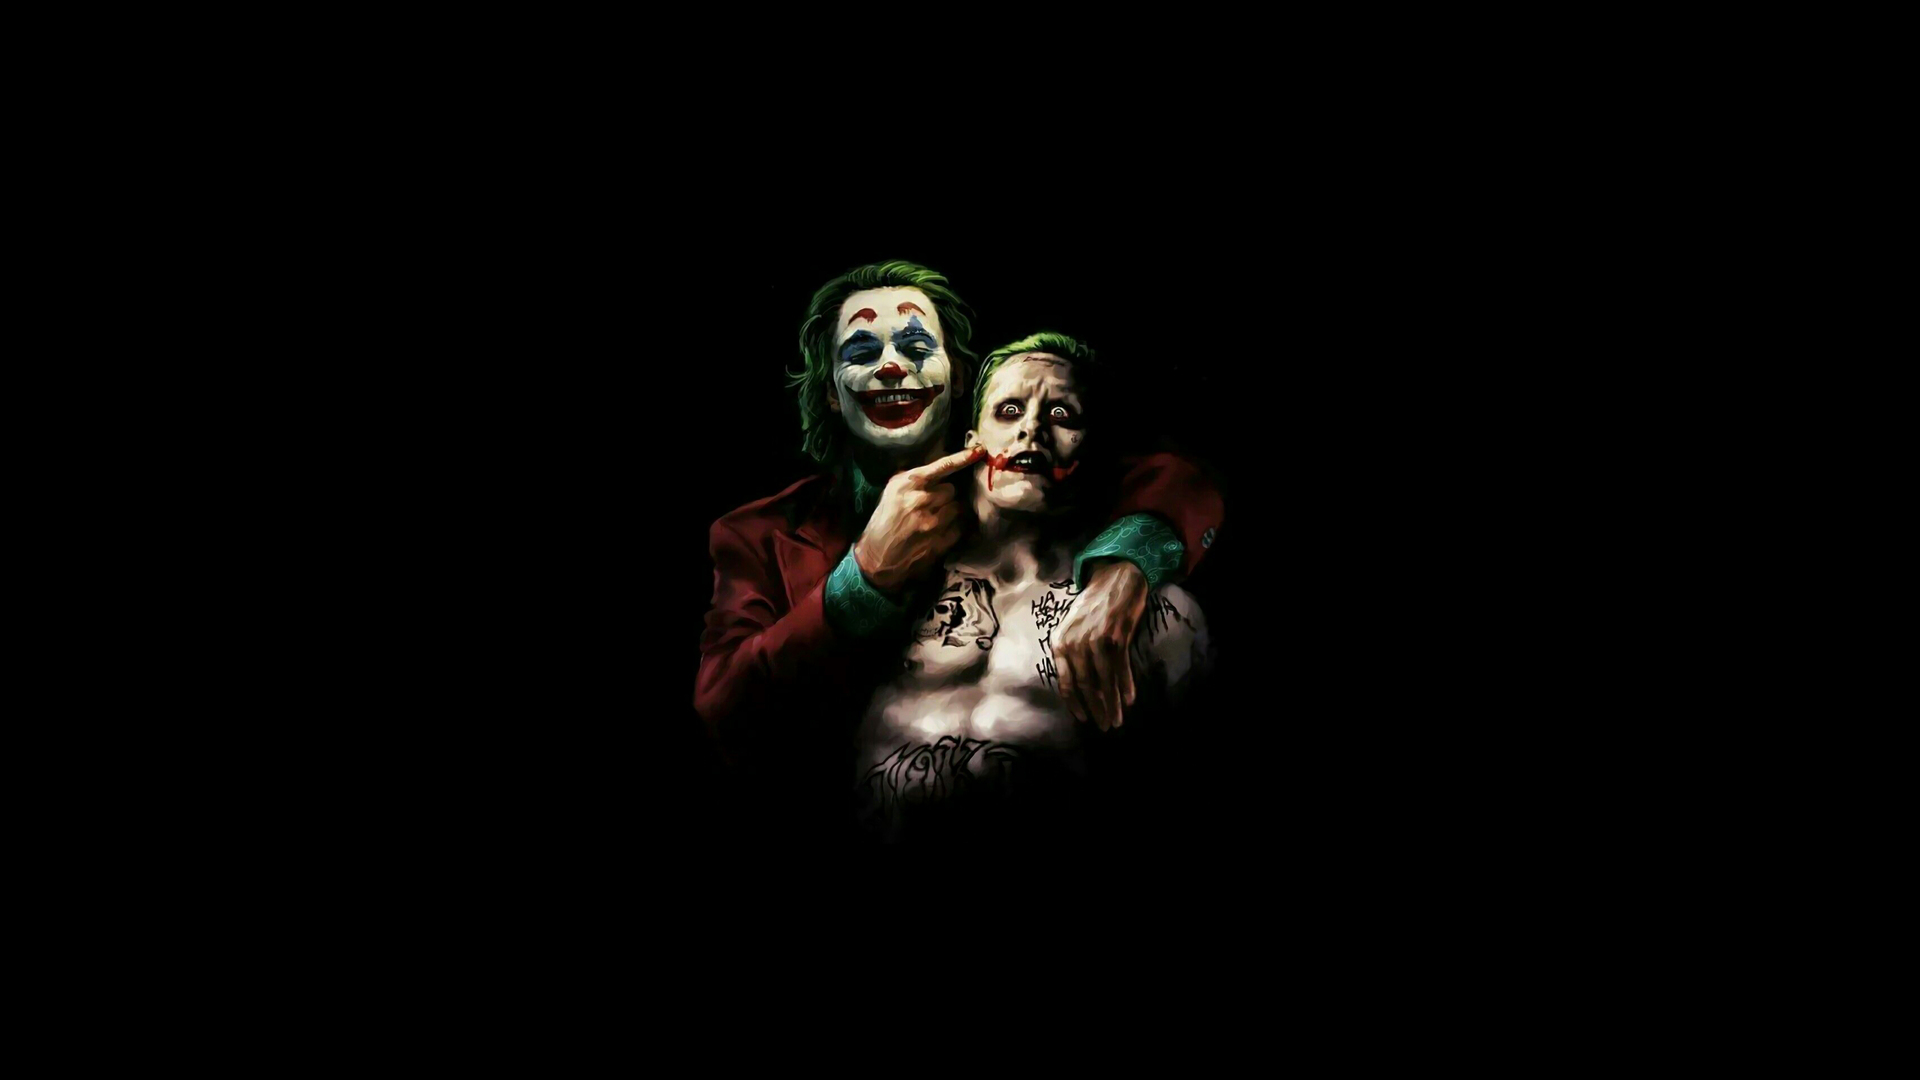 1920x1080 Joaquin Phoenix And Jared Leto As Joker 4k Laptop